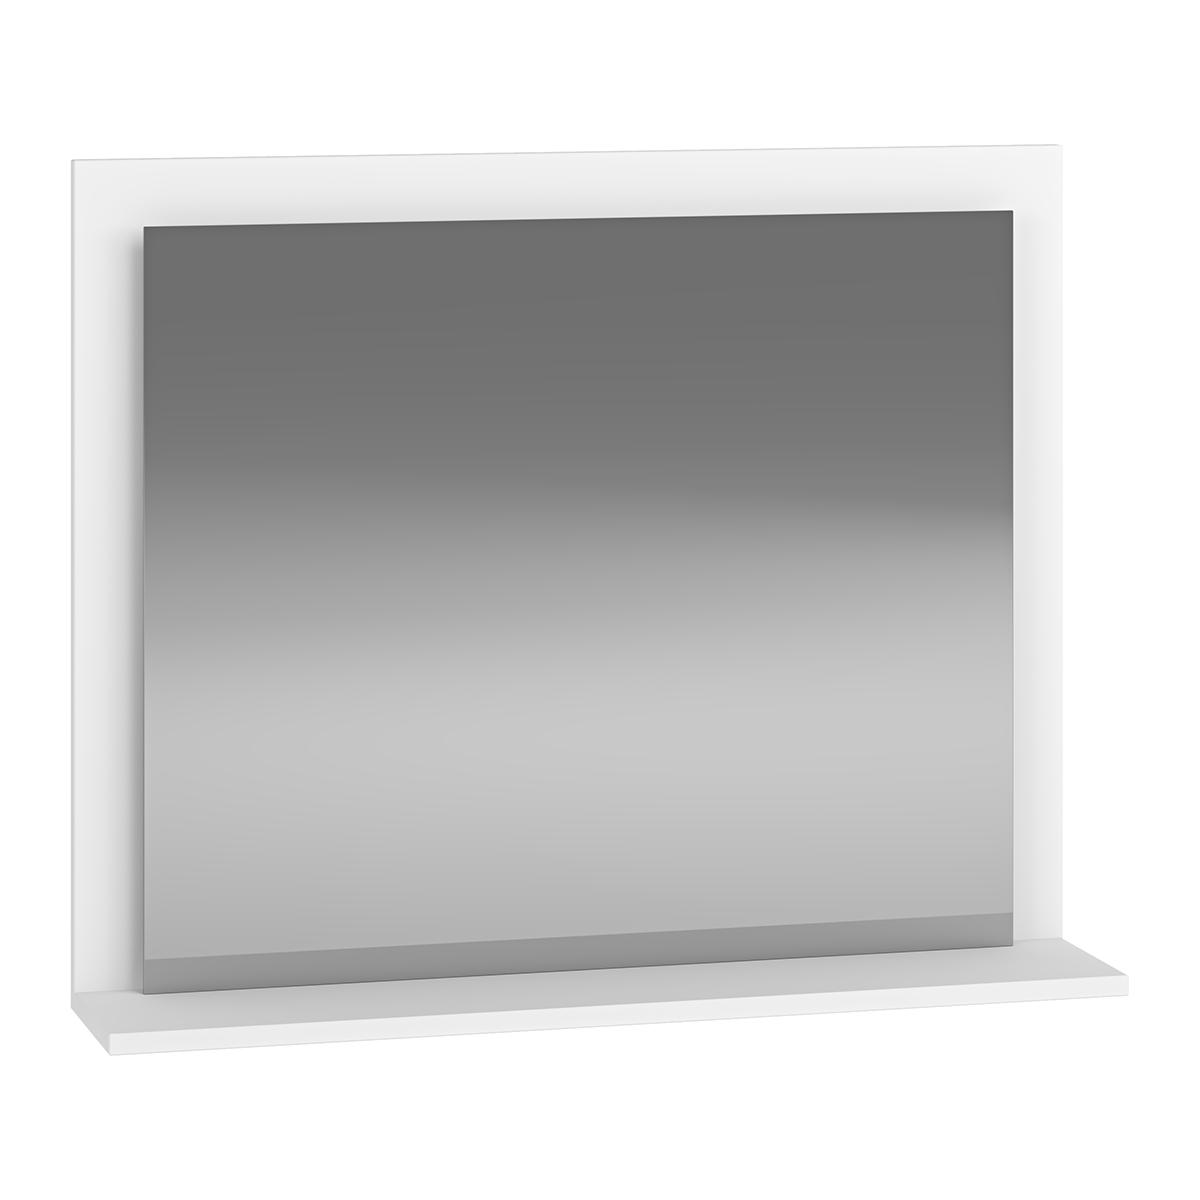 NABBI Baleta Z80 zrkadlo na stenu alaska